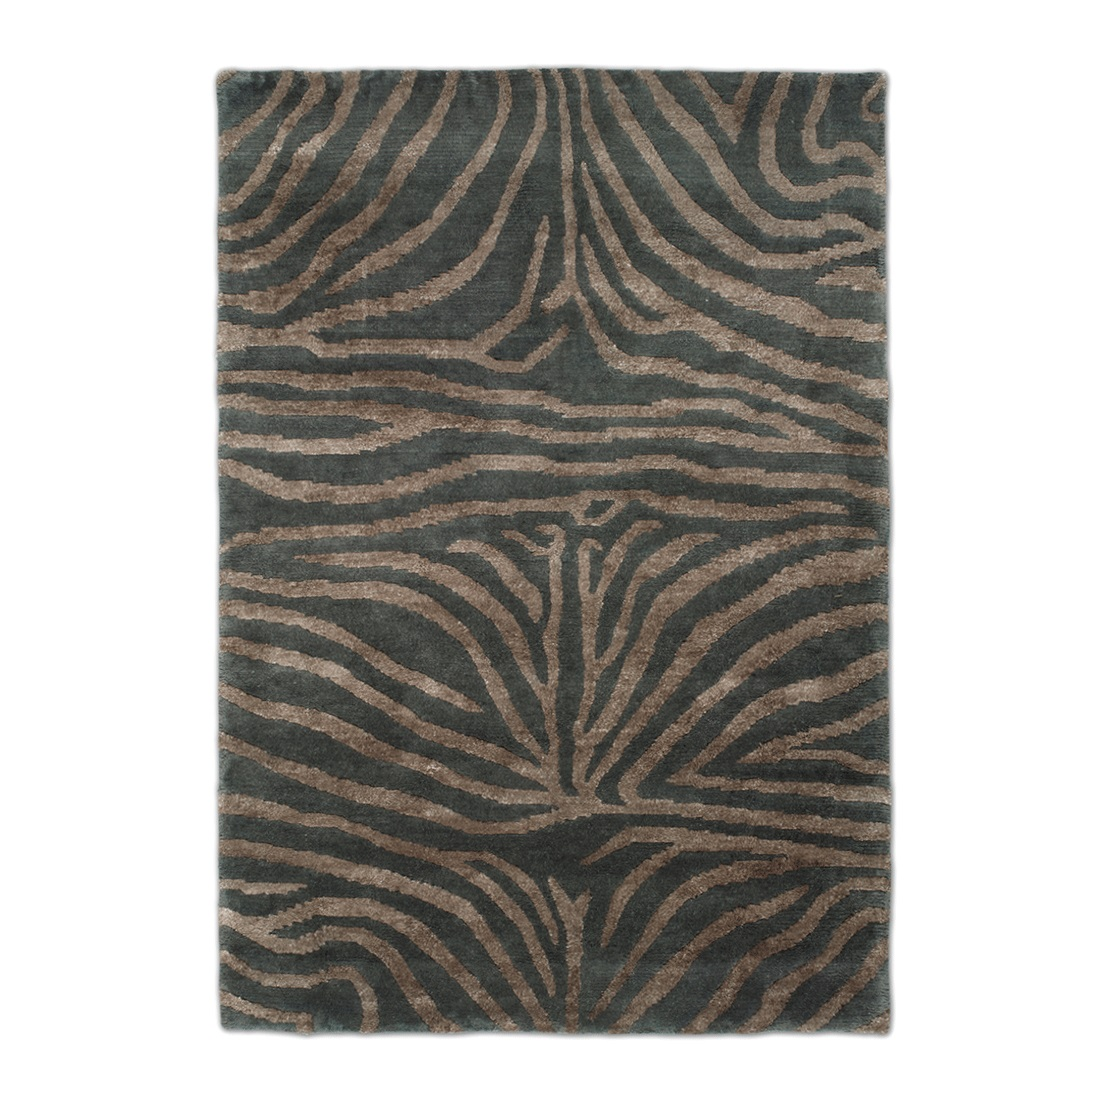 Zebramatta taupe 250 x 350 cm, Classic Collection